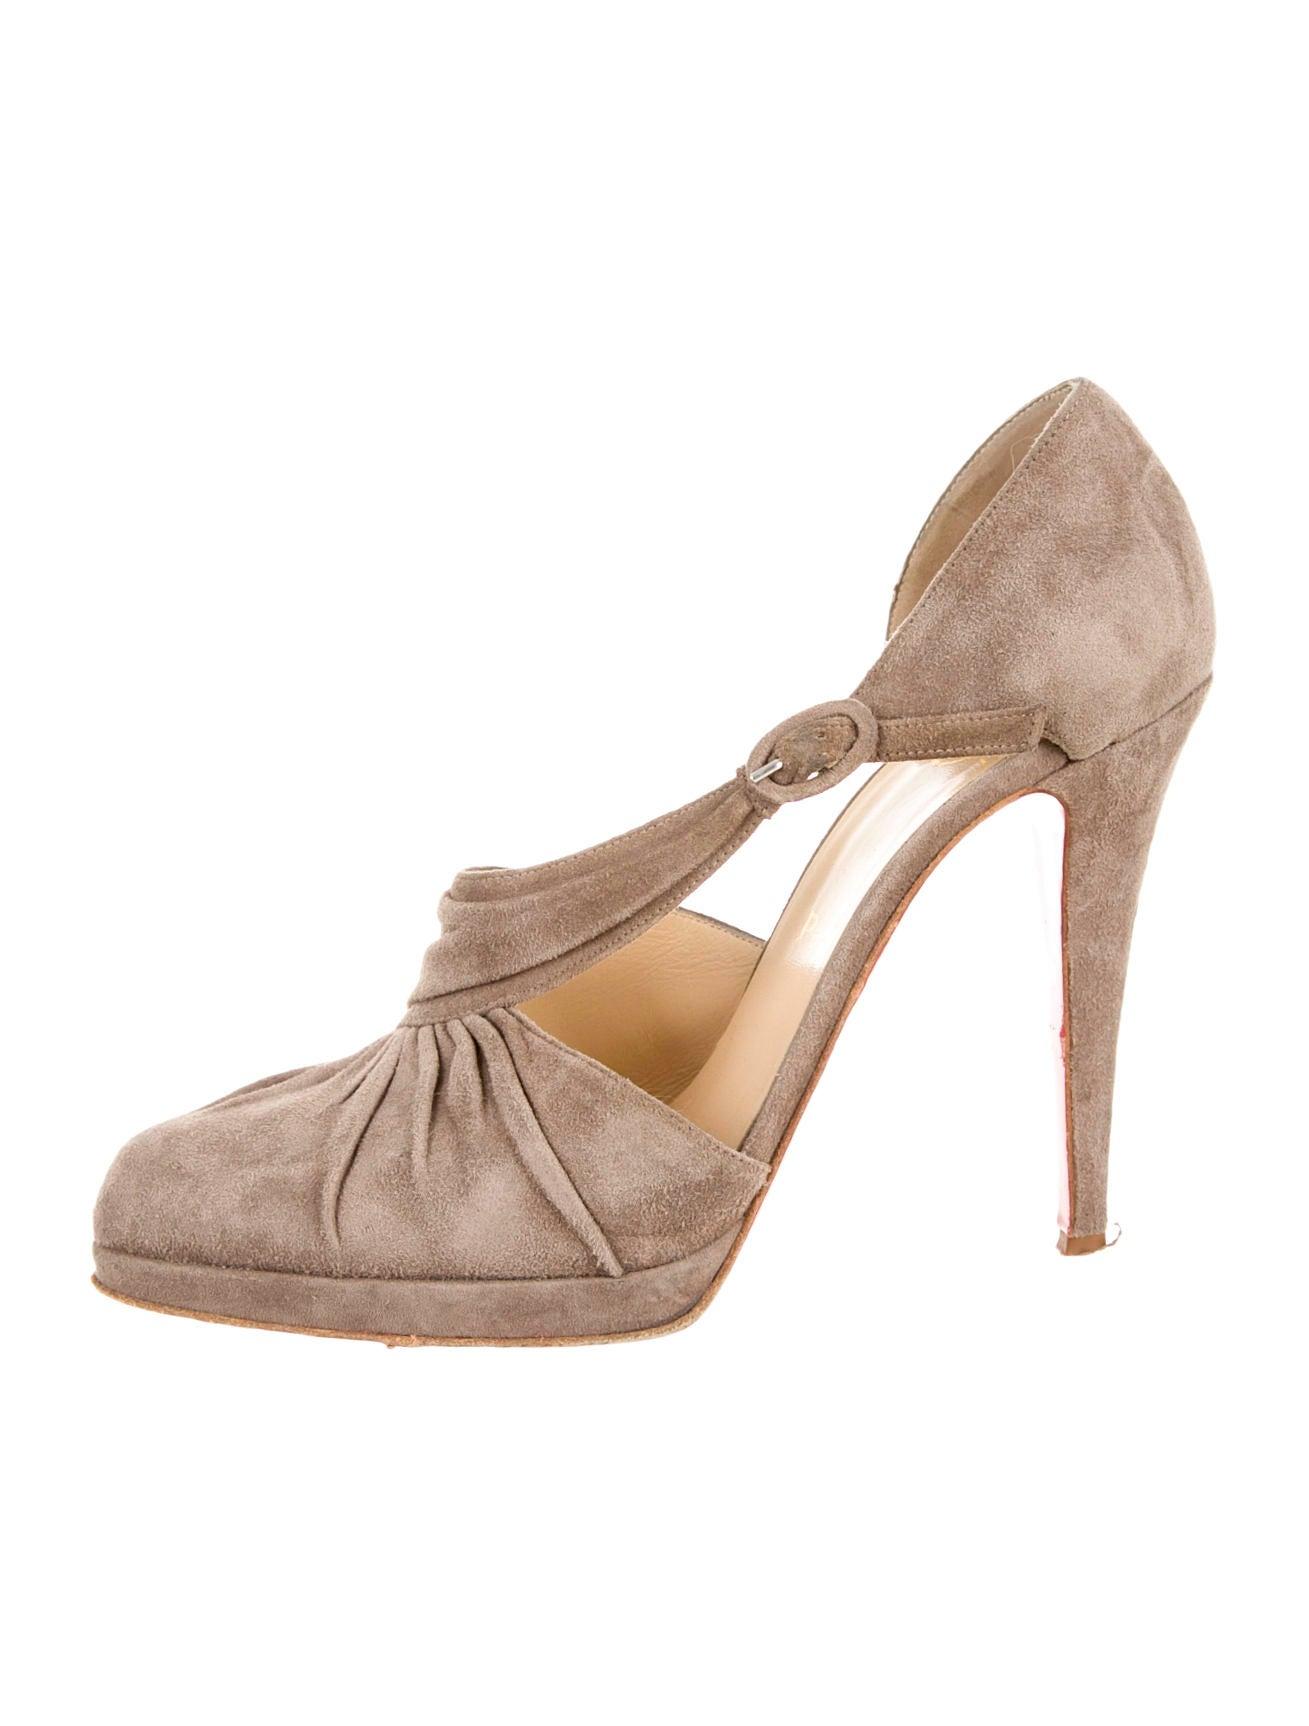 edf3e8f1c717 Artesur » christian louboutin pointed-toe pumps Grey suede buckle ...